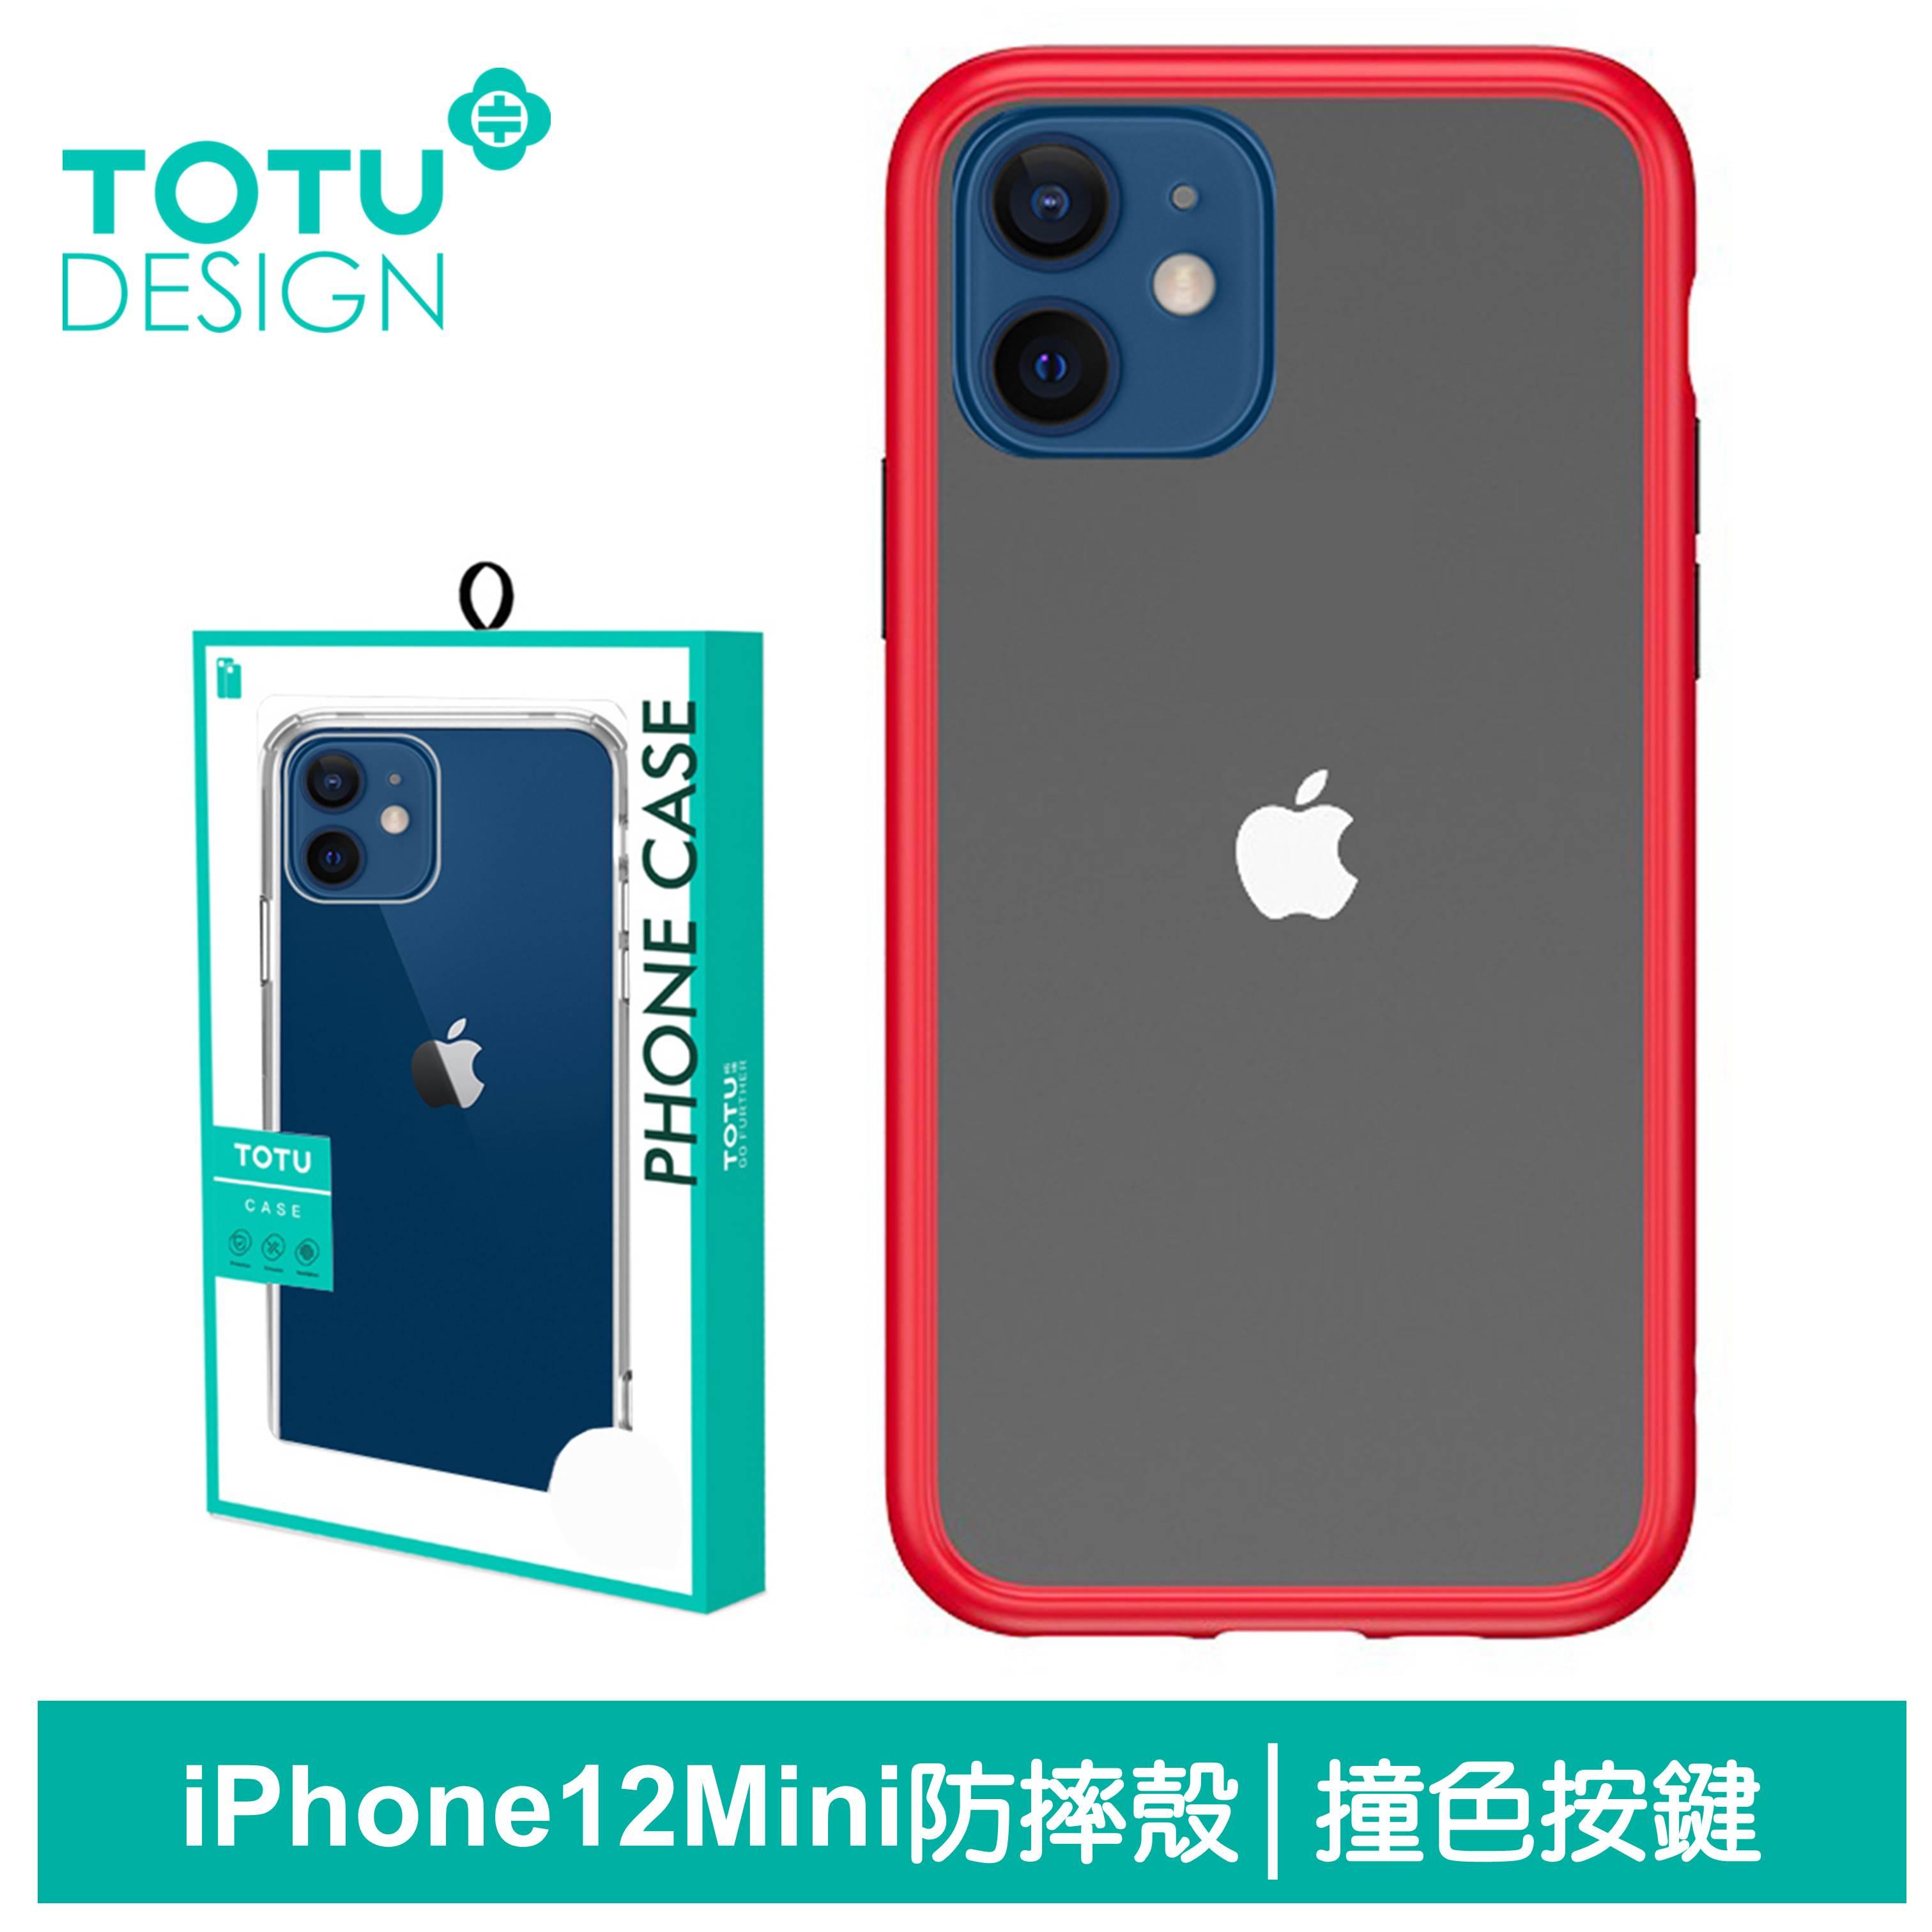 TOTU台灣官方 iPhone 12 Mini 手機殼 i12 Mini 保護殼 5.4吋 防摔殼 撞色按鍵 晶剛系列 紅色